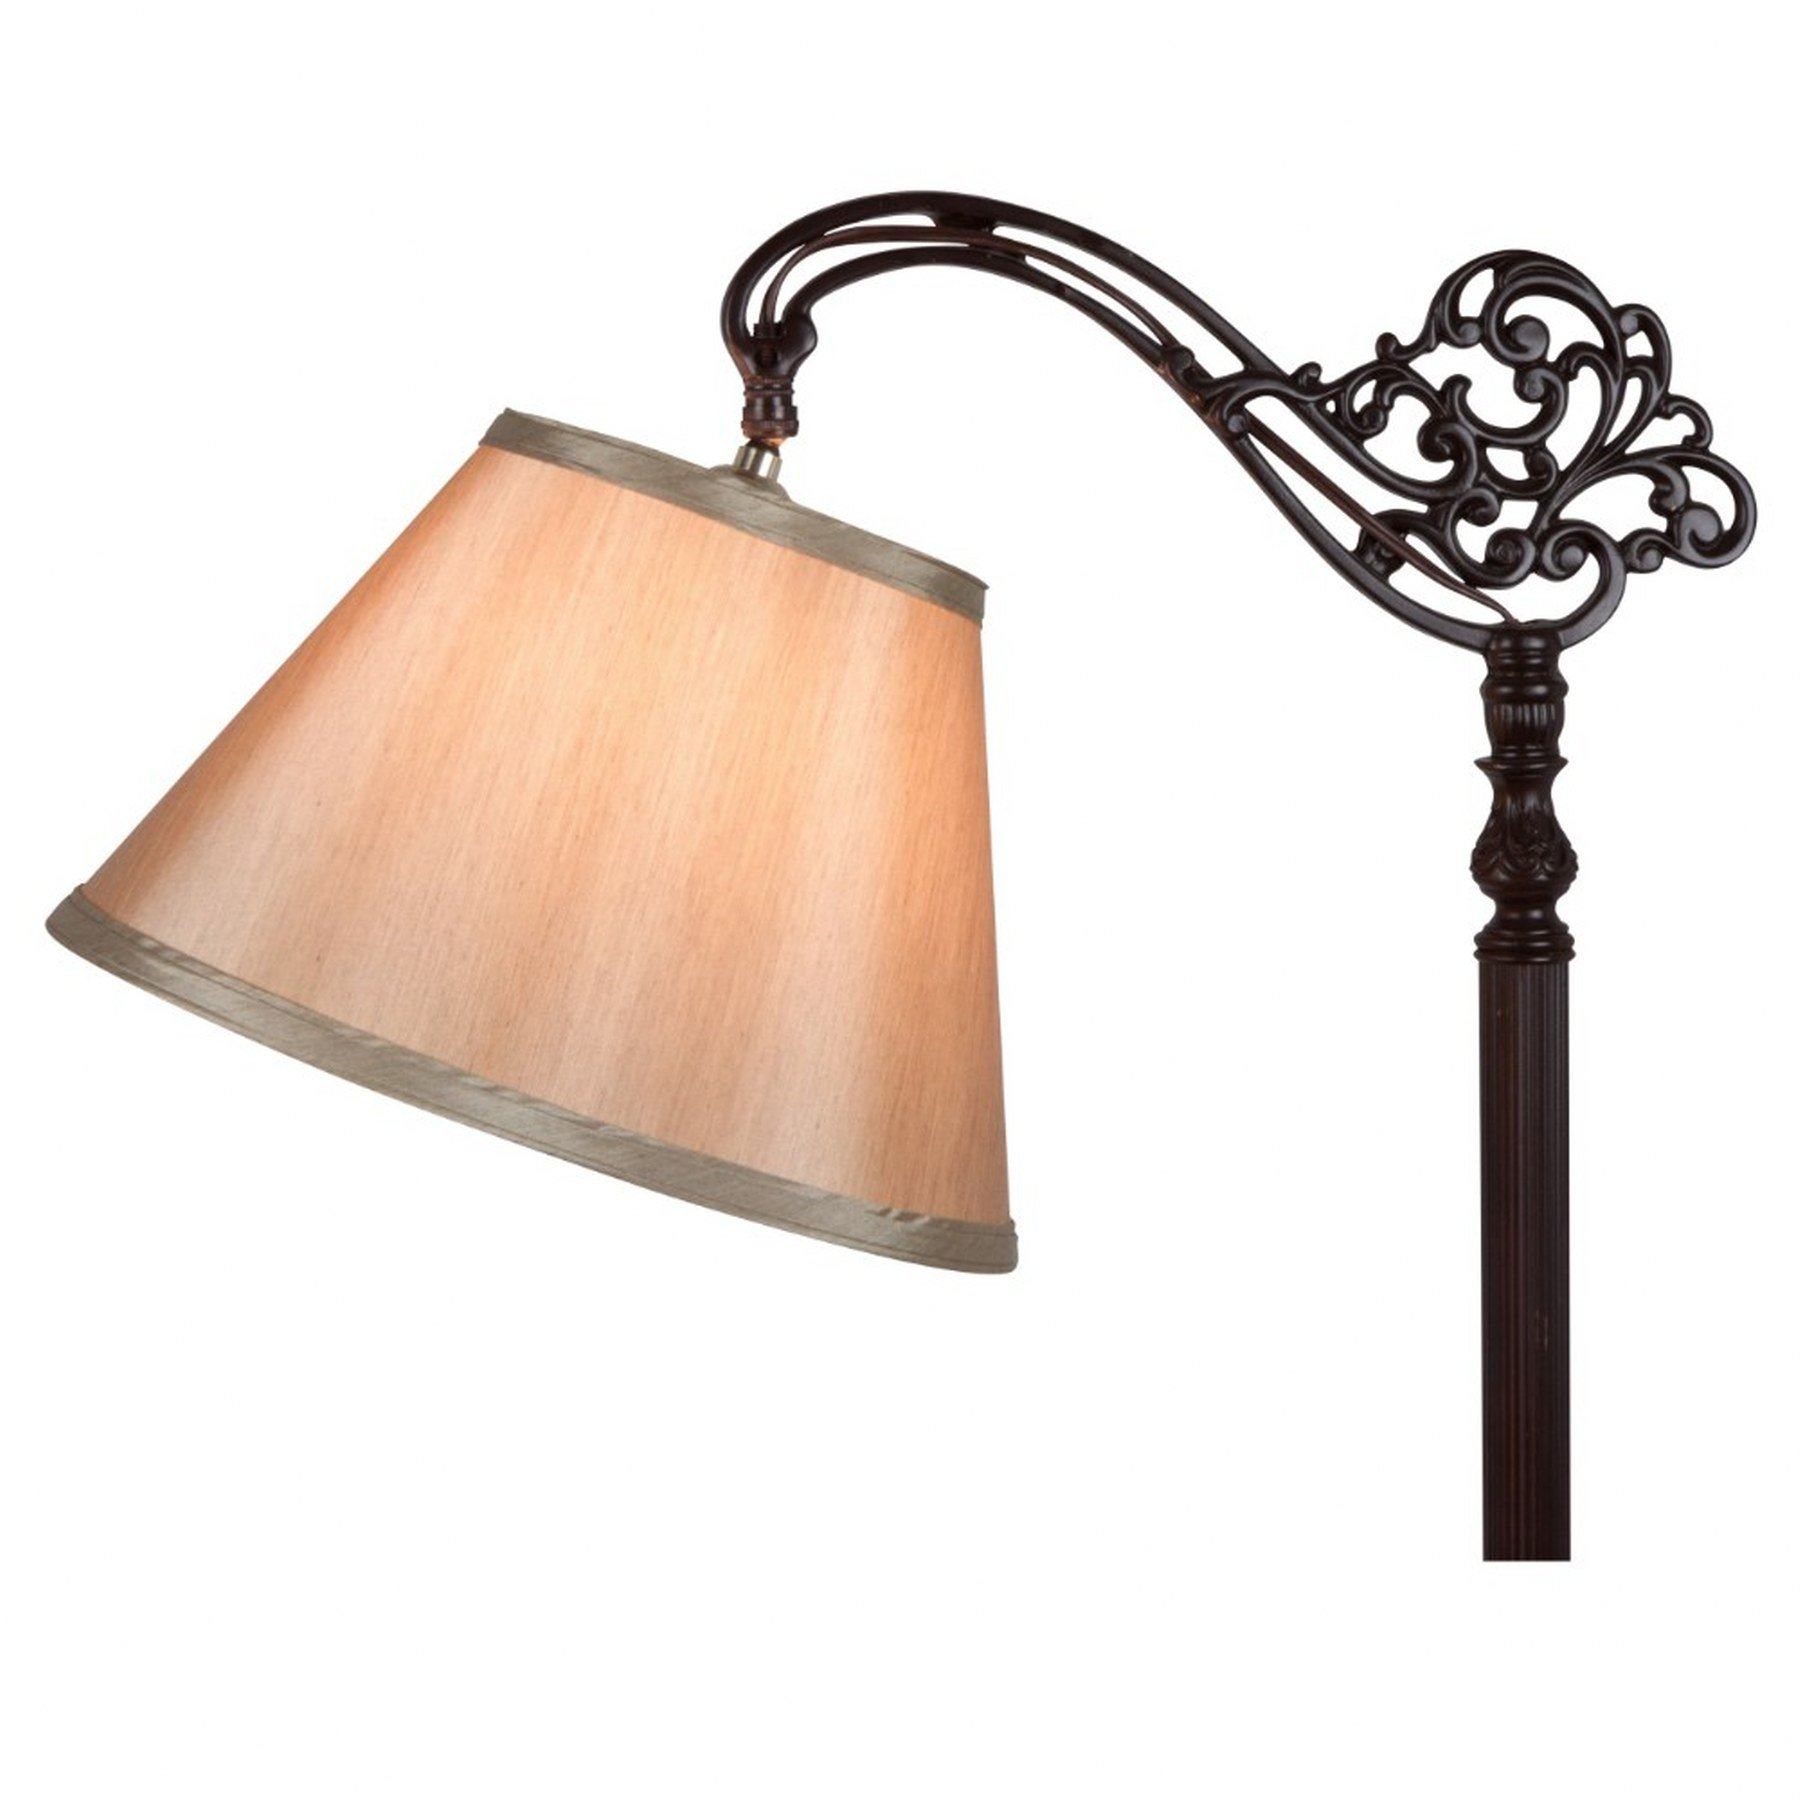 Upgradelights 12 Inch Bronze Uno Lamp Shade Downbridge (6x12x8)